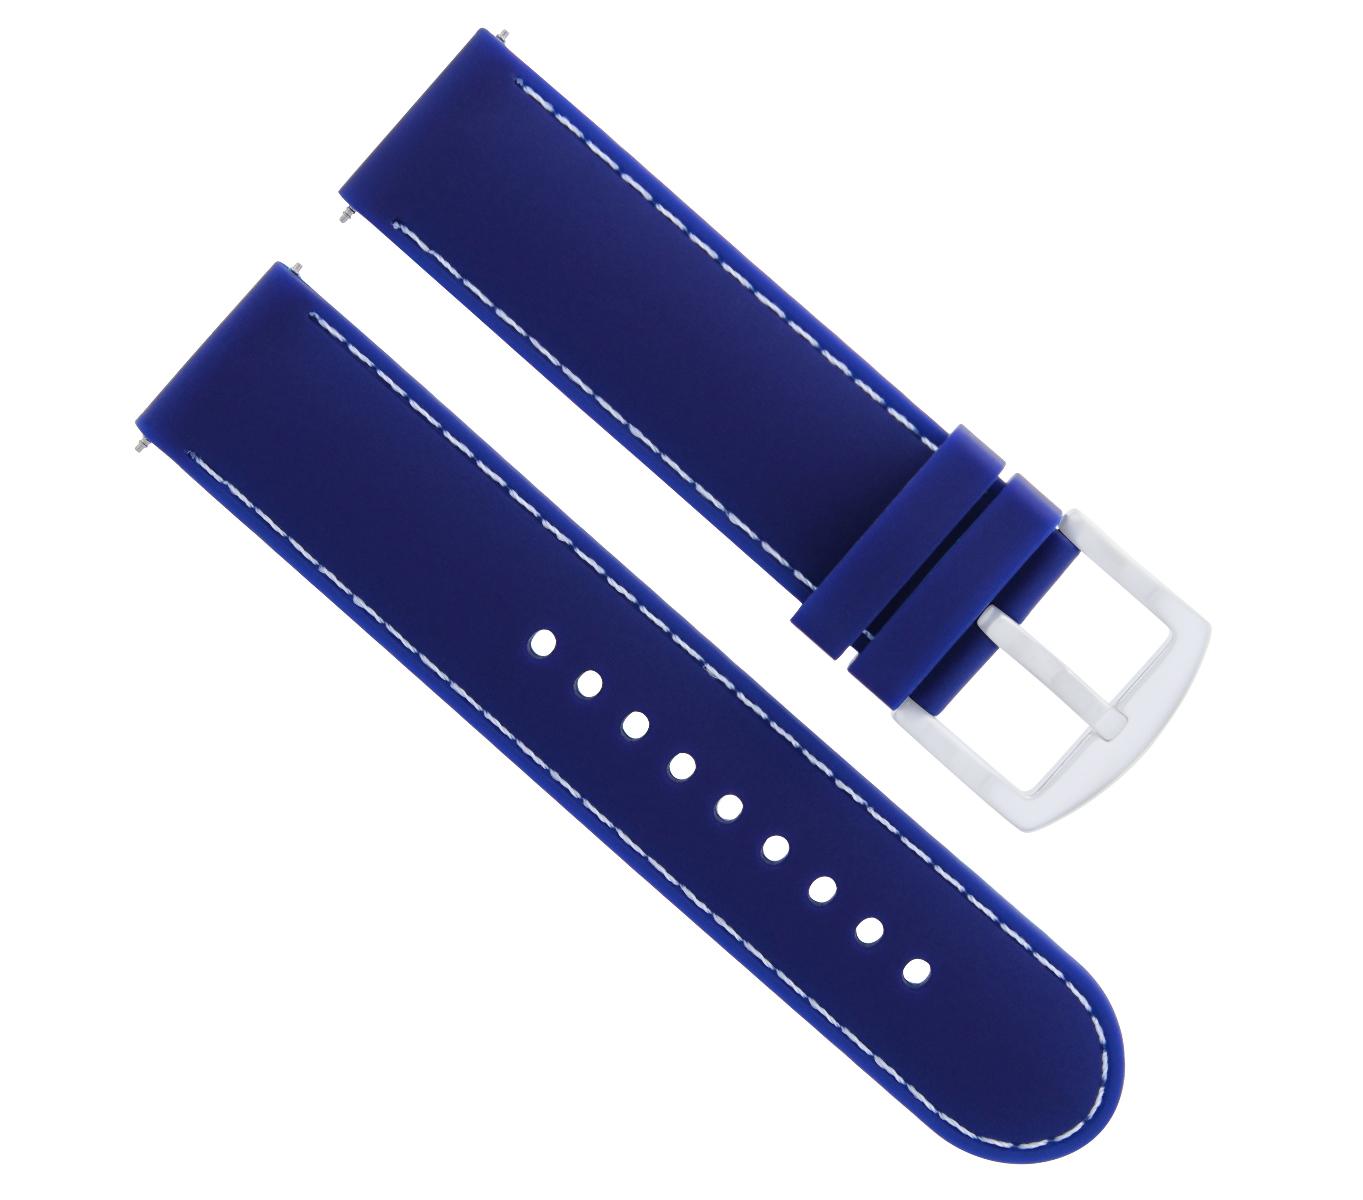 22MM RUBBER WATCH BAND STRAP FOR SEIKO WATCH SKX007 SKX009 SKX175 SKX176 BLUE WS